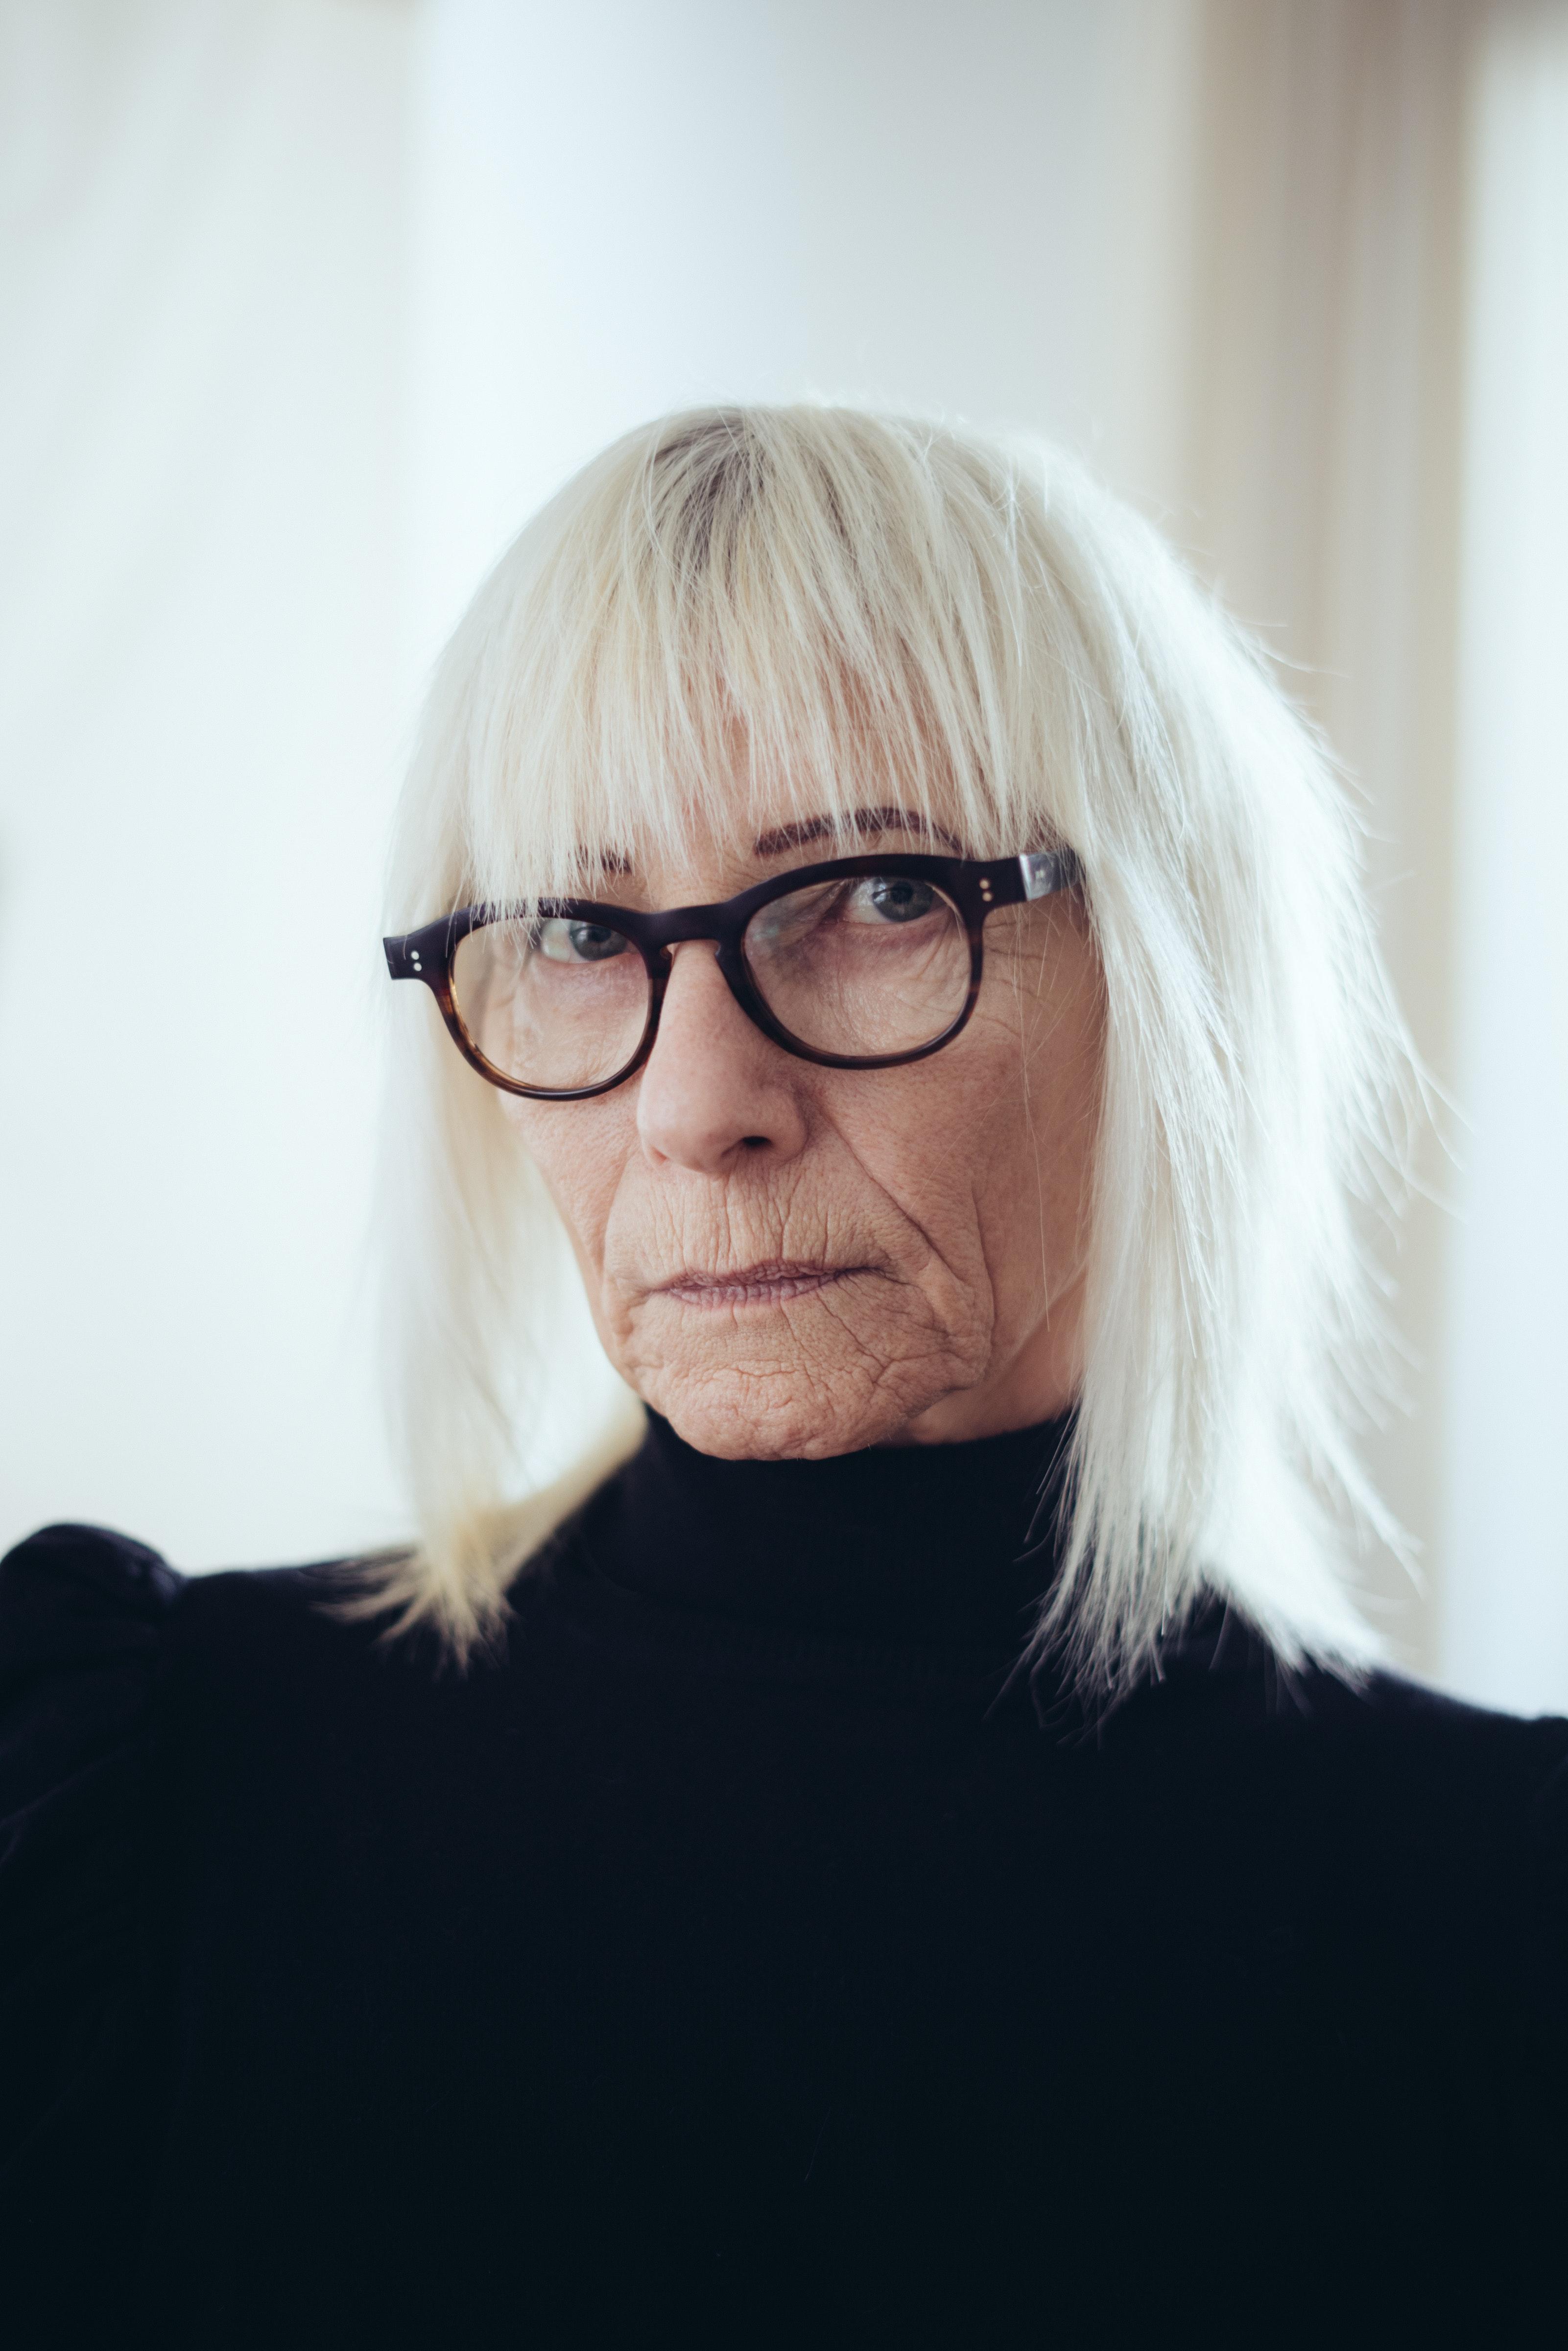 woman-in-black-shirt-wearing-black-framed-eyeglasses-3867093 by Retha Ferguson